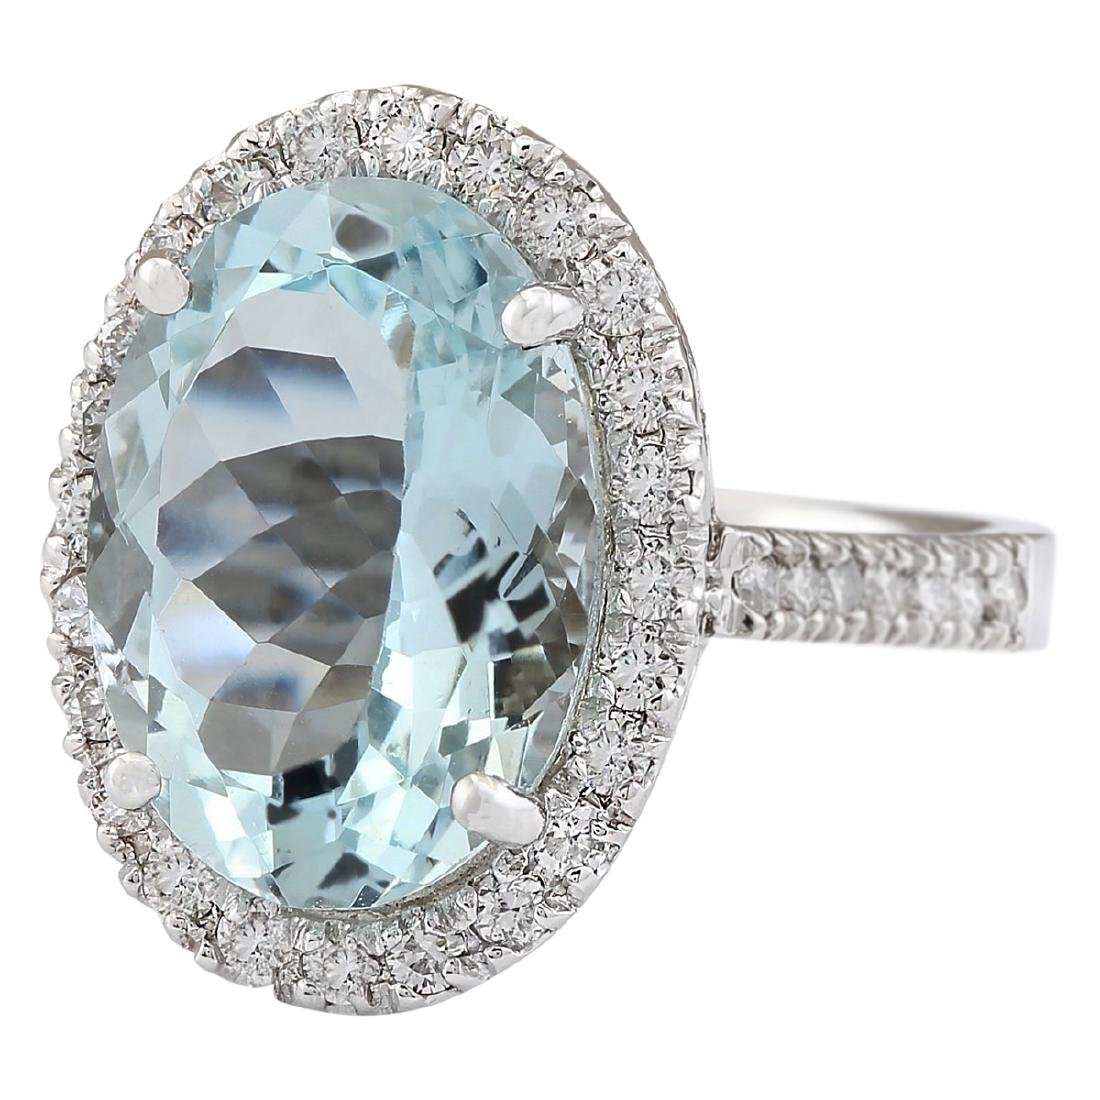 6.90 CTW Natural Aquamarine And Diamond Ring In 18K - 2